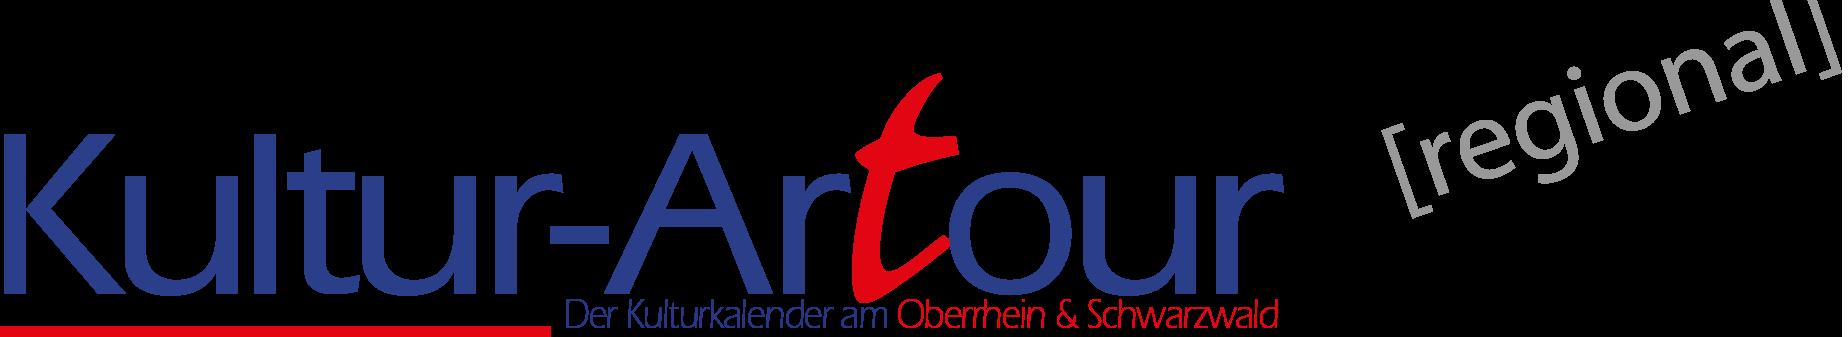 Kultur-Artour – Kulturkalender am Oberrhein & Schwarzwald – Online Magazin